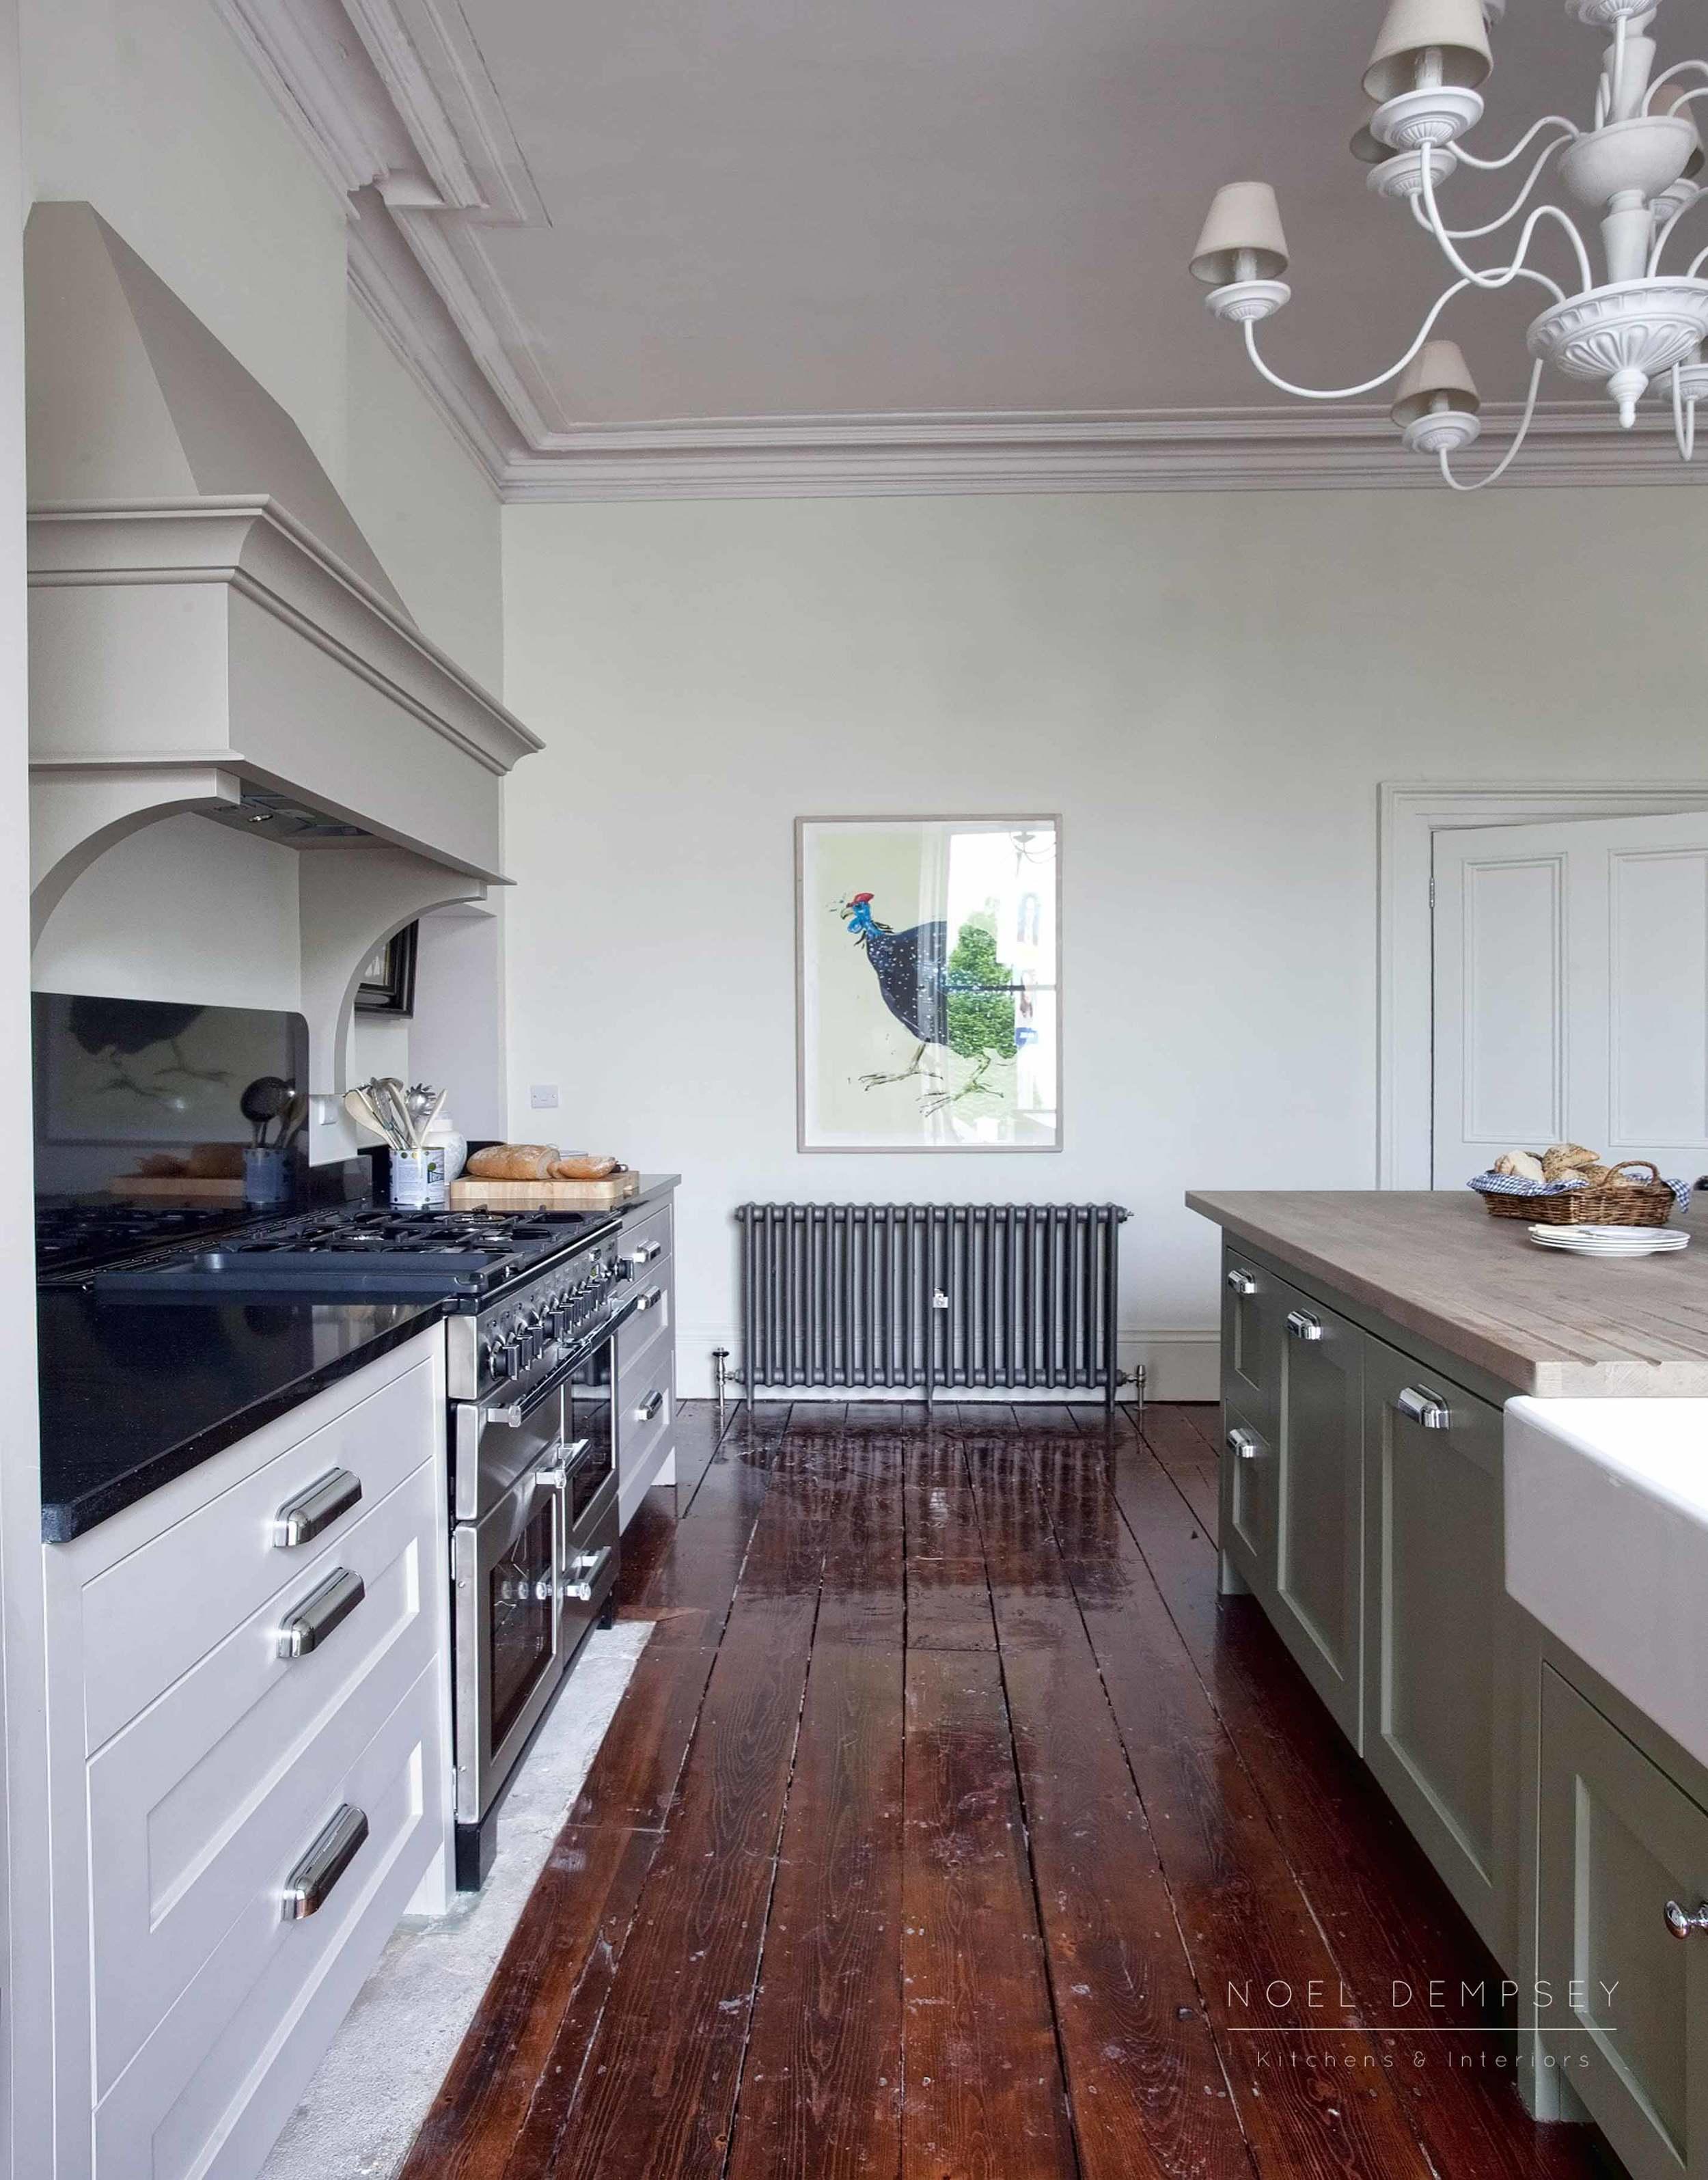 Belgrave-Plain-English-Kitchens-Ireland-3.jpg